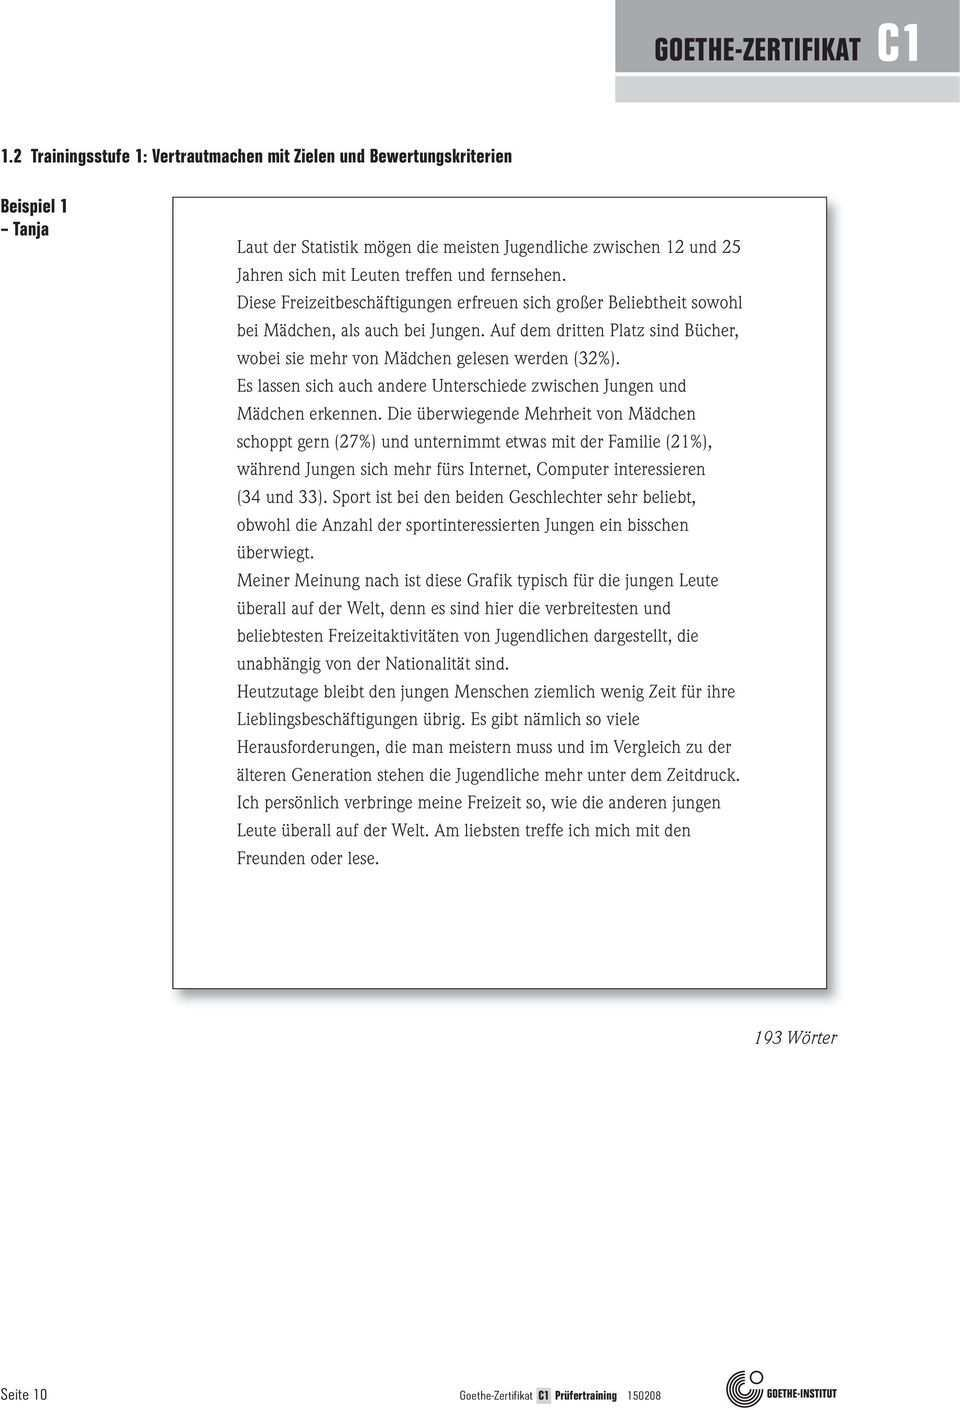 Goethe Zertifikat C1 Trainingsmaterial Fur Prufende Schriftlich Mundlich B1 B2 C1 C2 Pdf Free Download